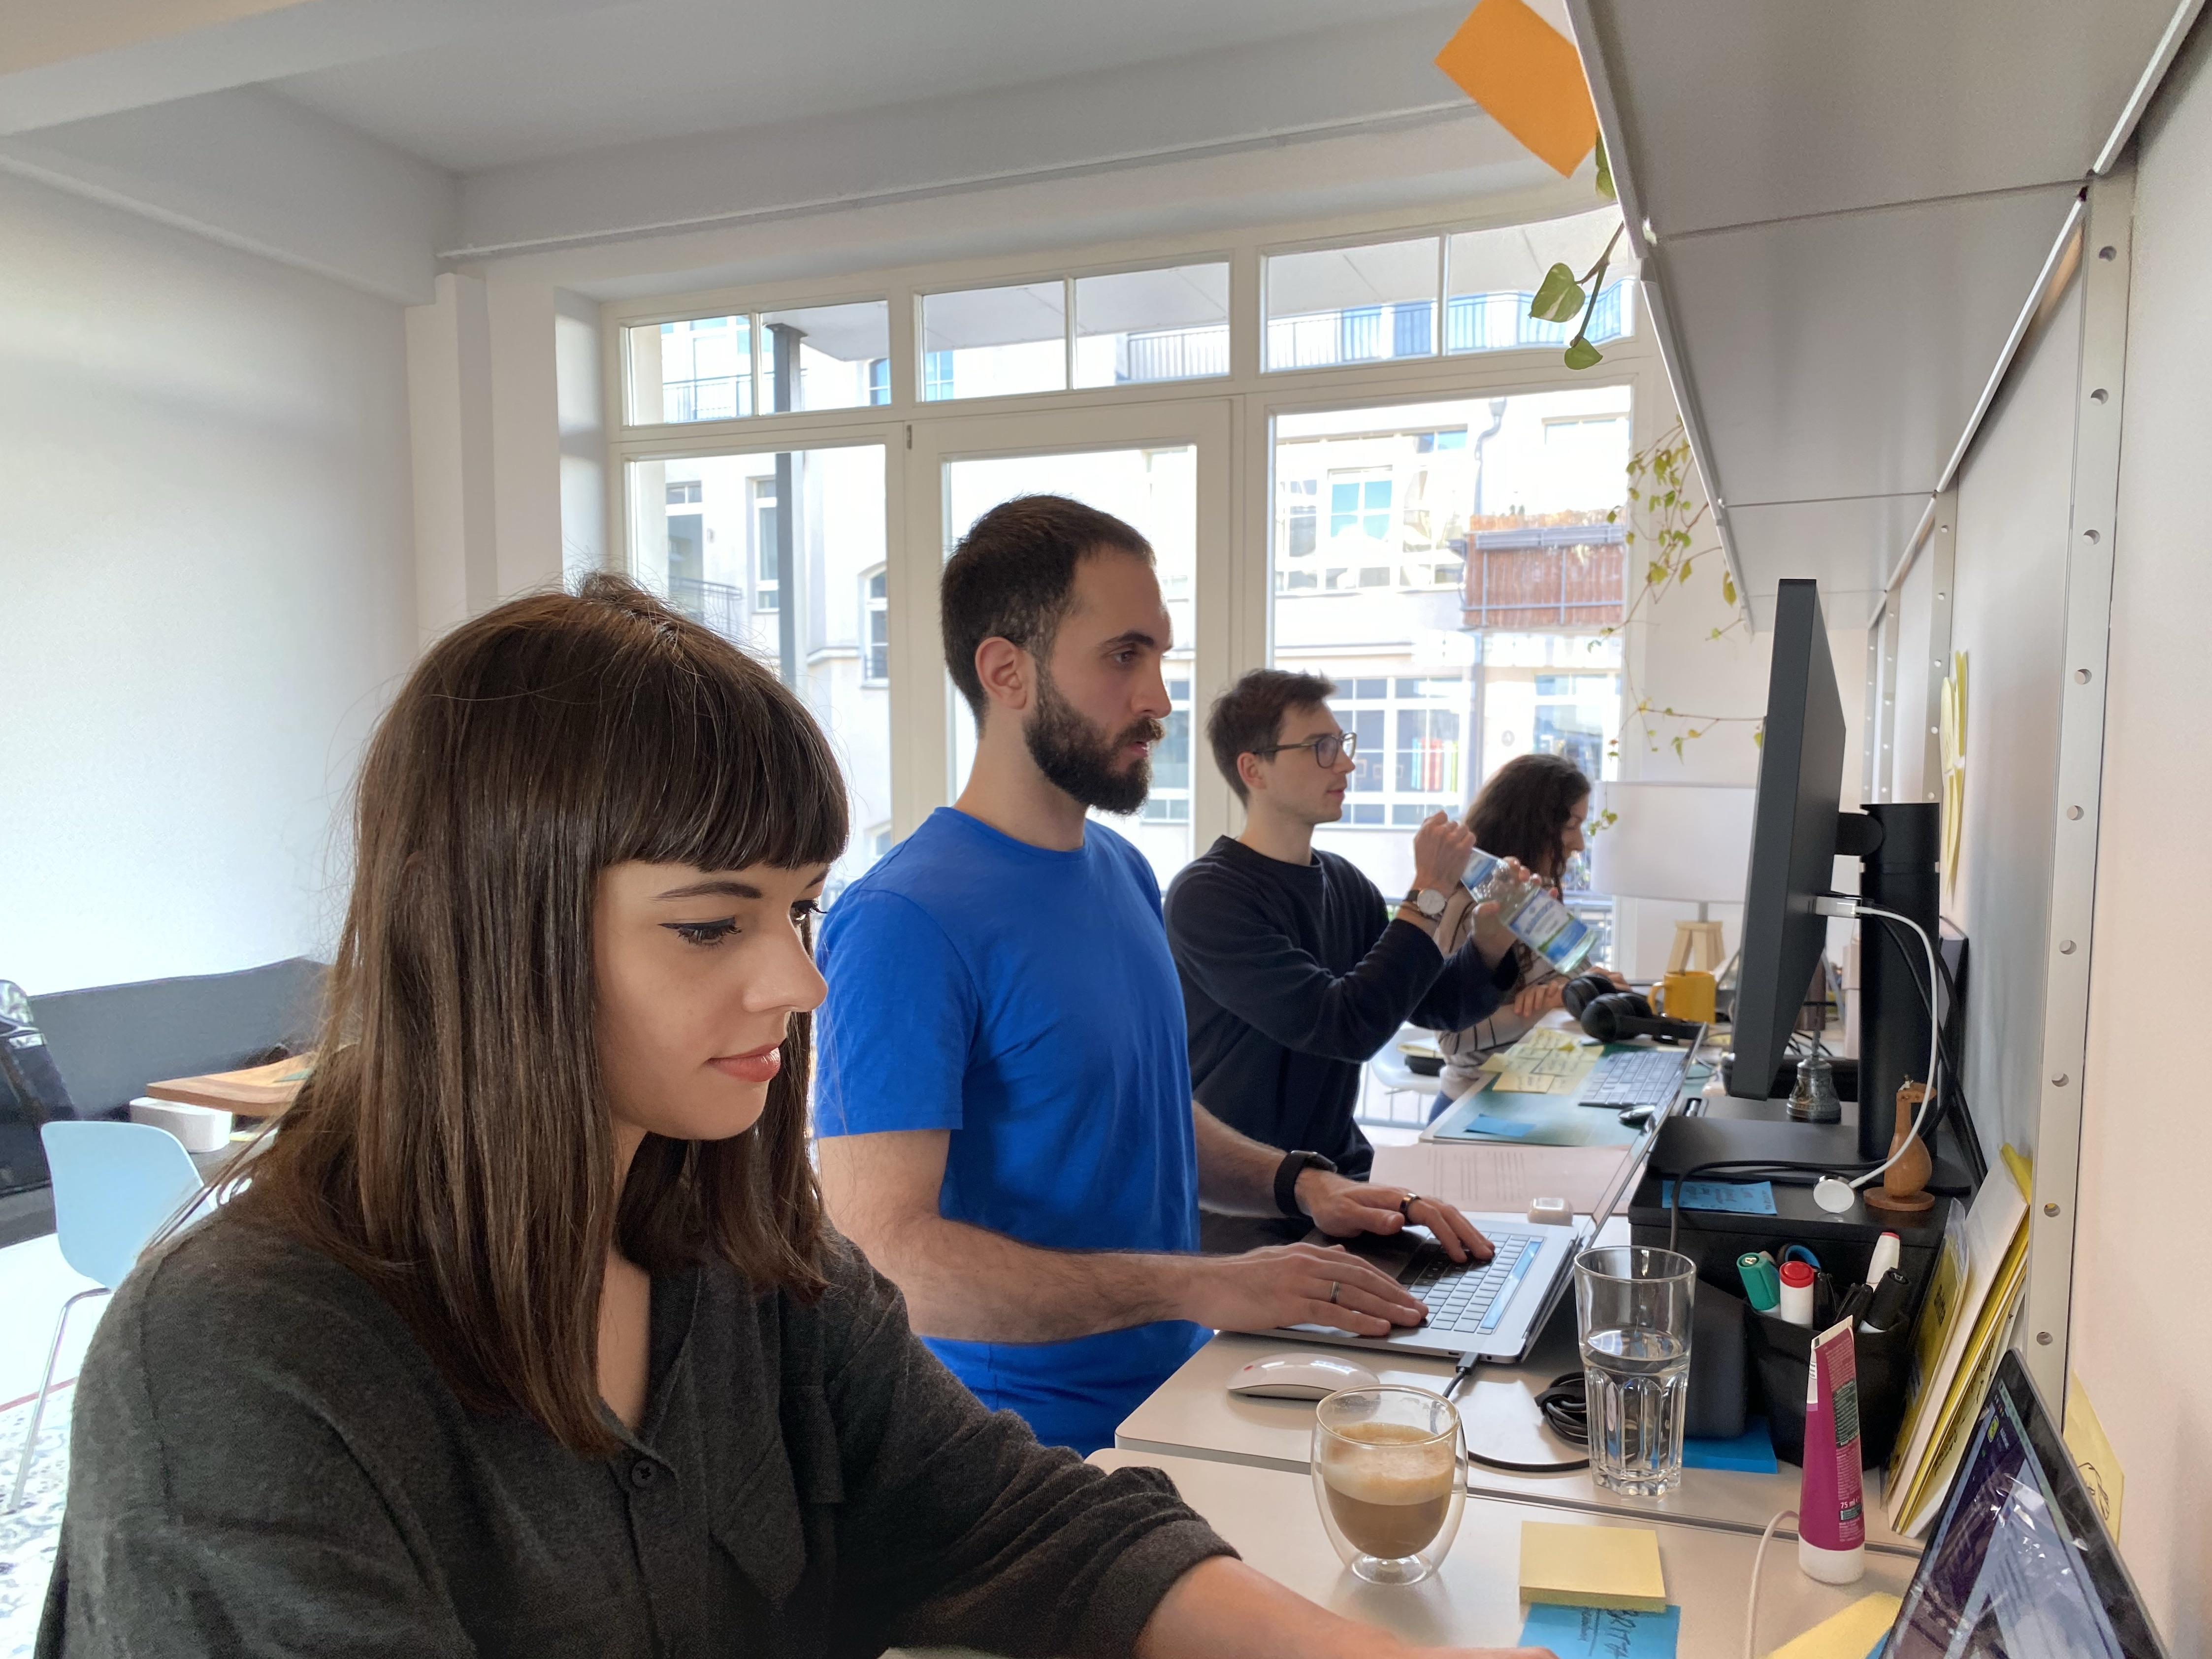 AJ&Smart workshop team